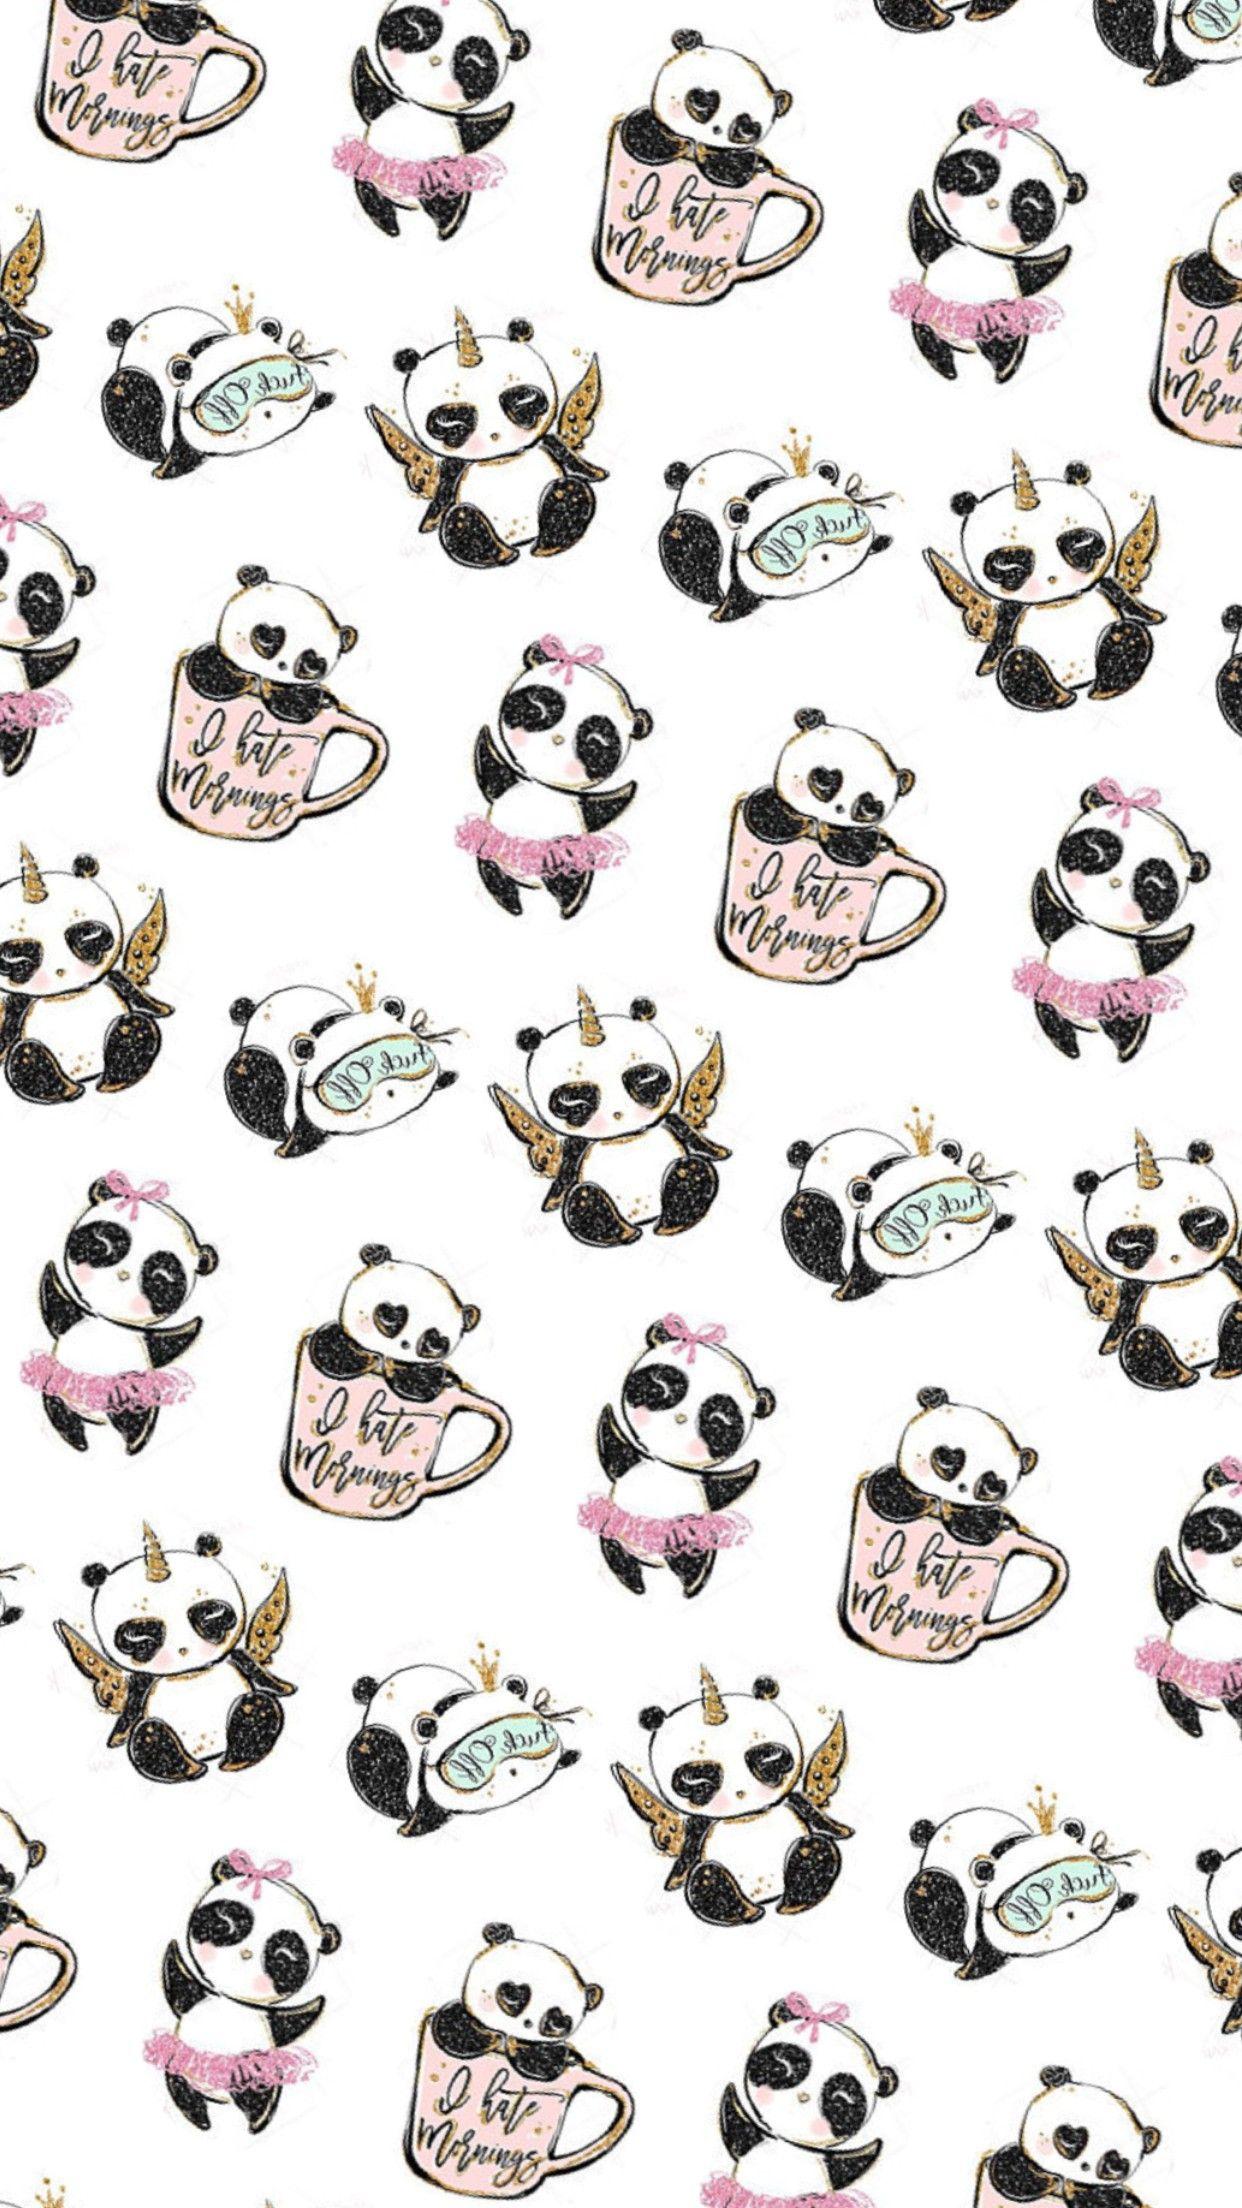 Fond d'écran | Fond d'écran panda, Mini dessin, Fond d'écran téléphone